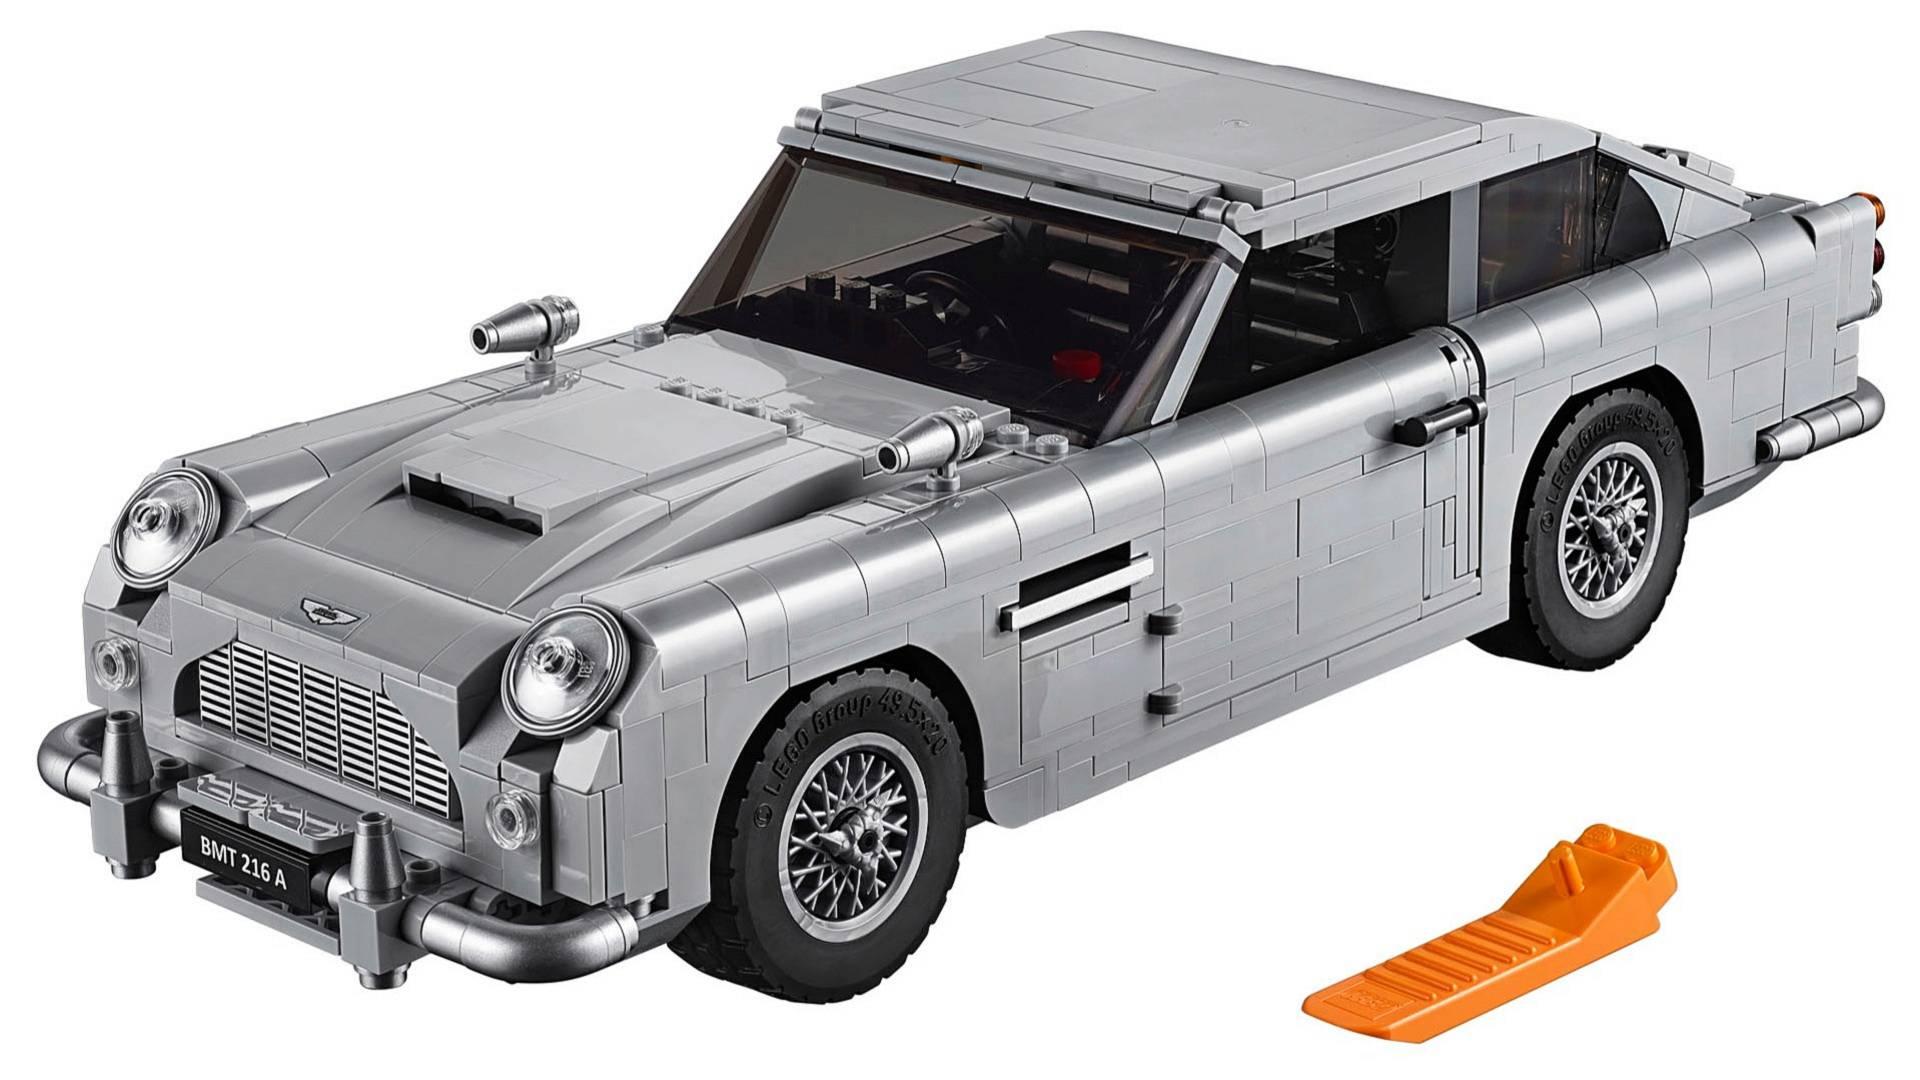 Lego James Bond Aston Martin DB Revealed - Aston martin db5 kit car